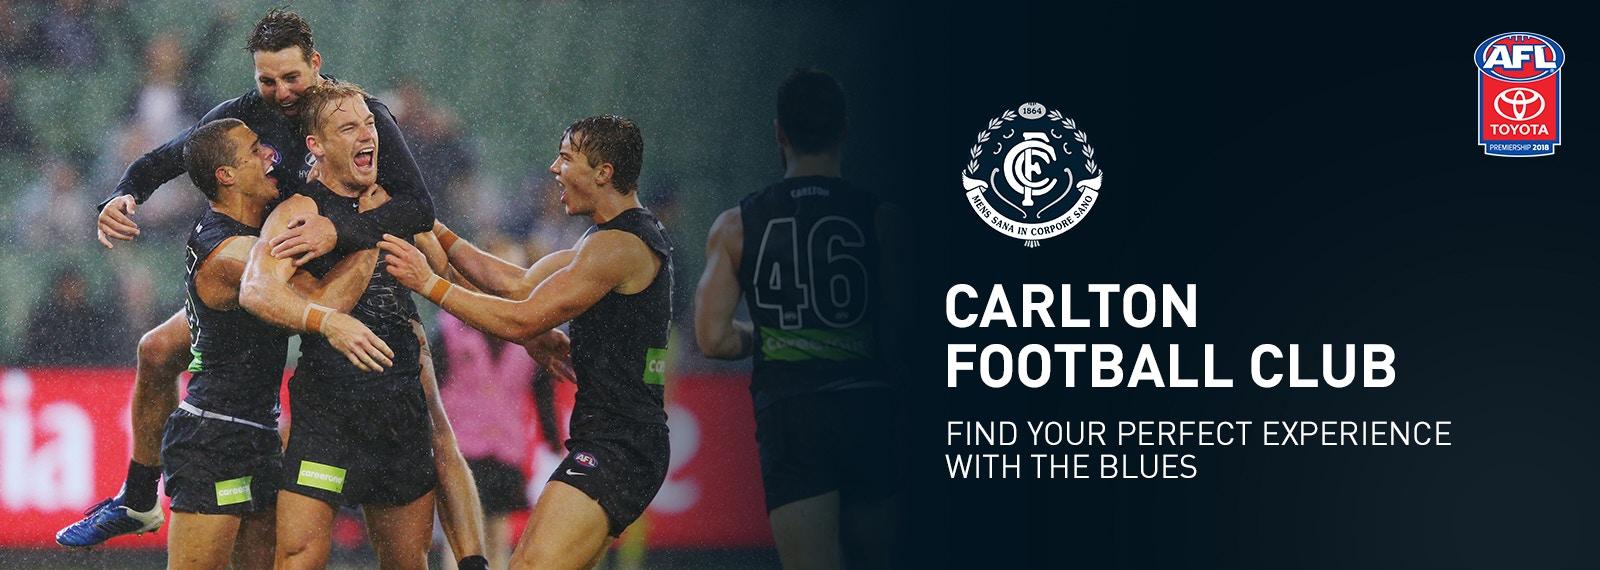 Carlton Football Club   2018 Top Experiences